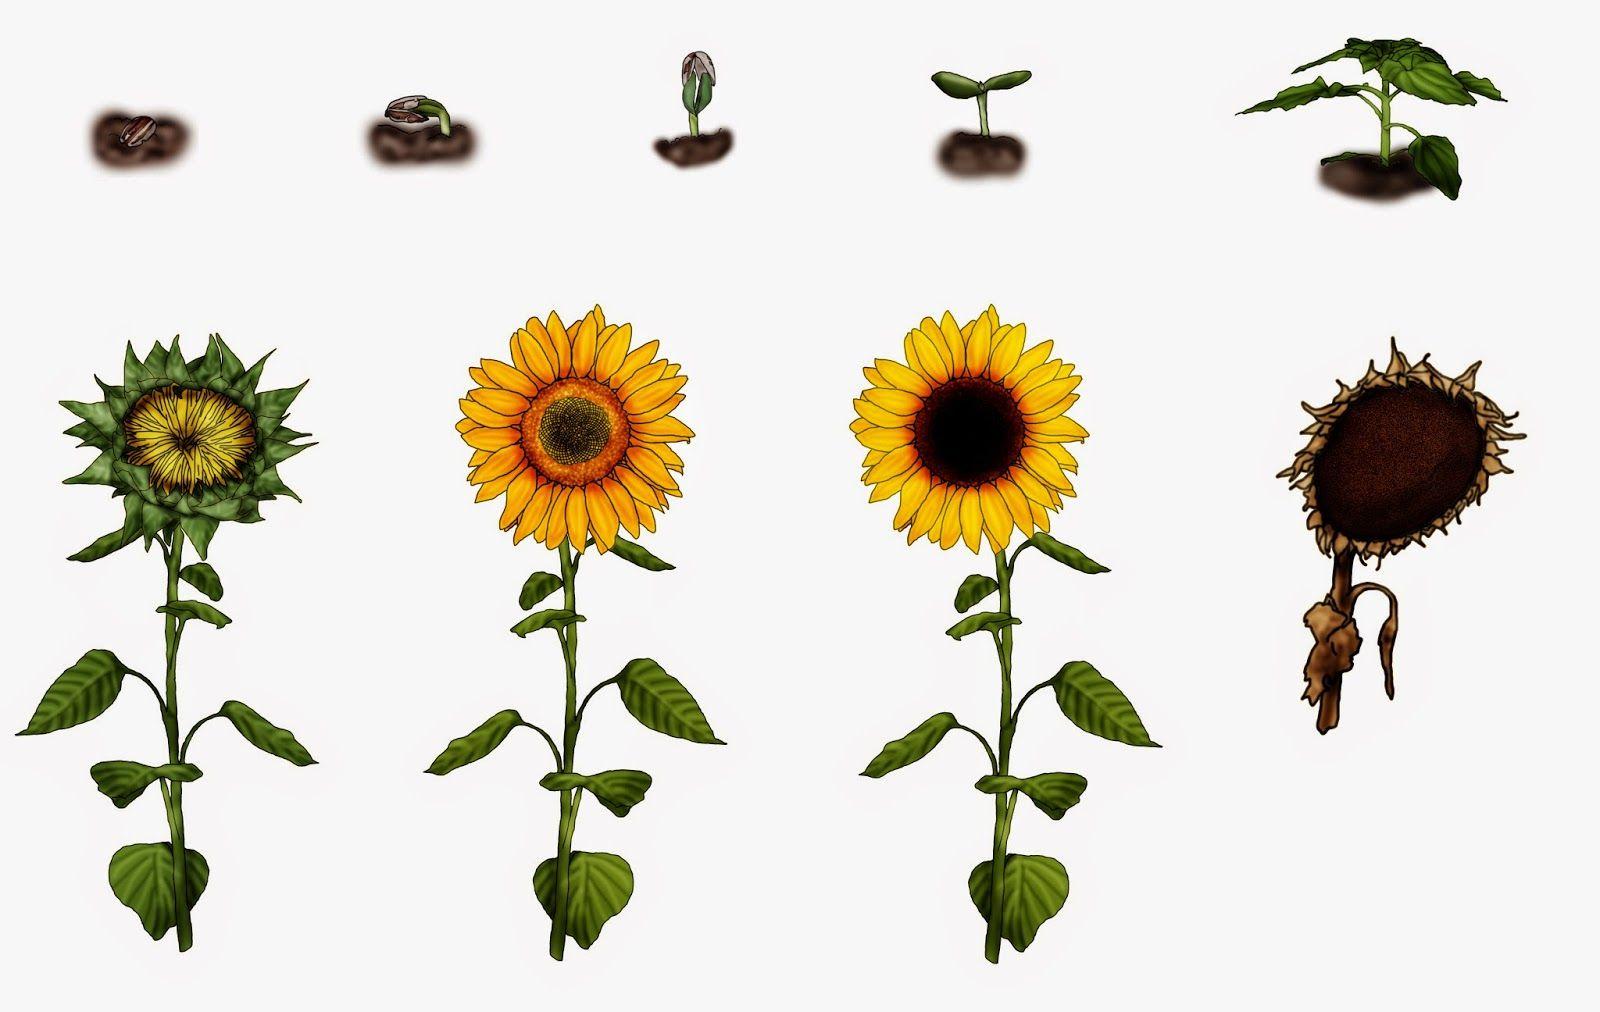 krabbelwiese: Entwicklung der Sonnenblume | cykle | Pinterest ...